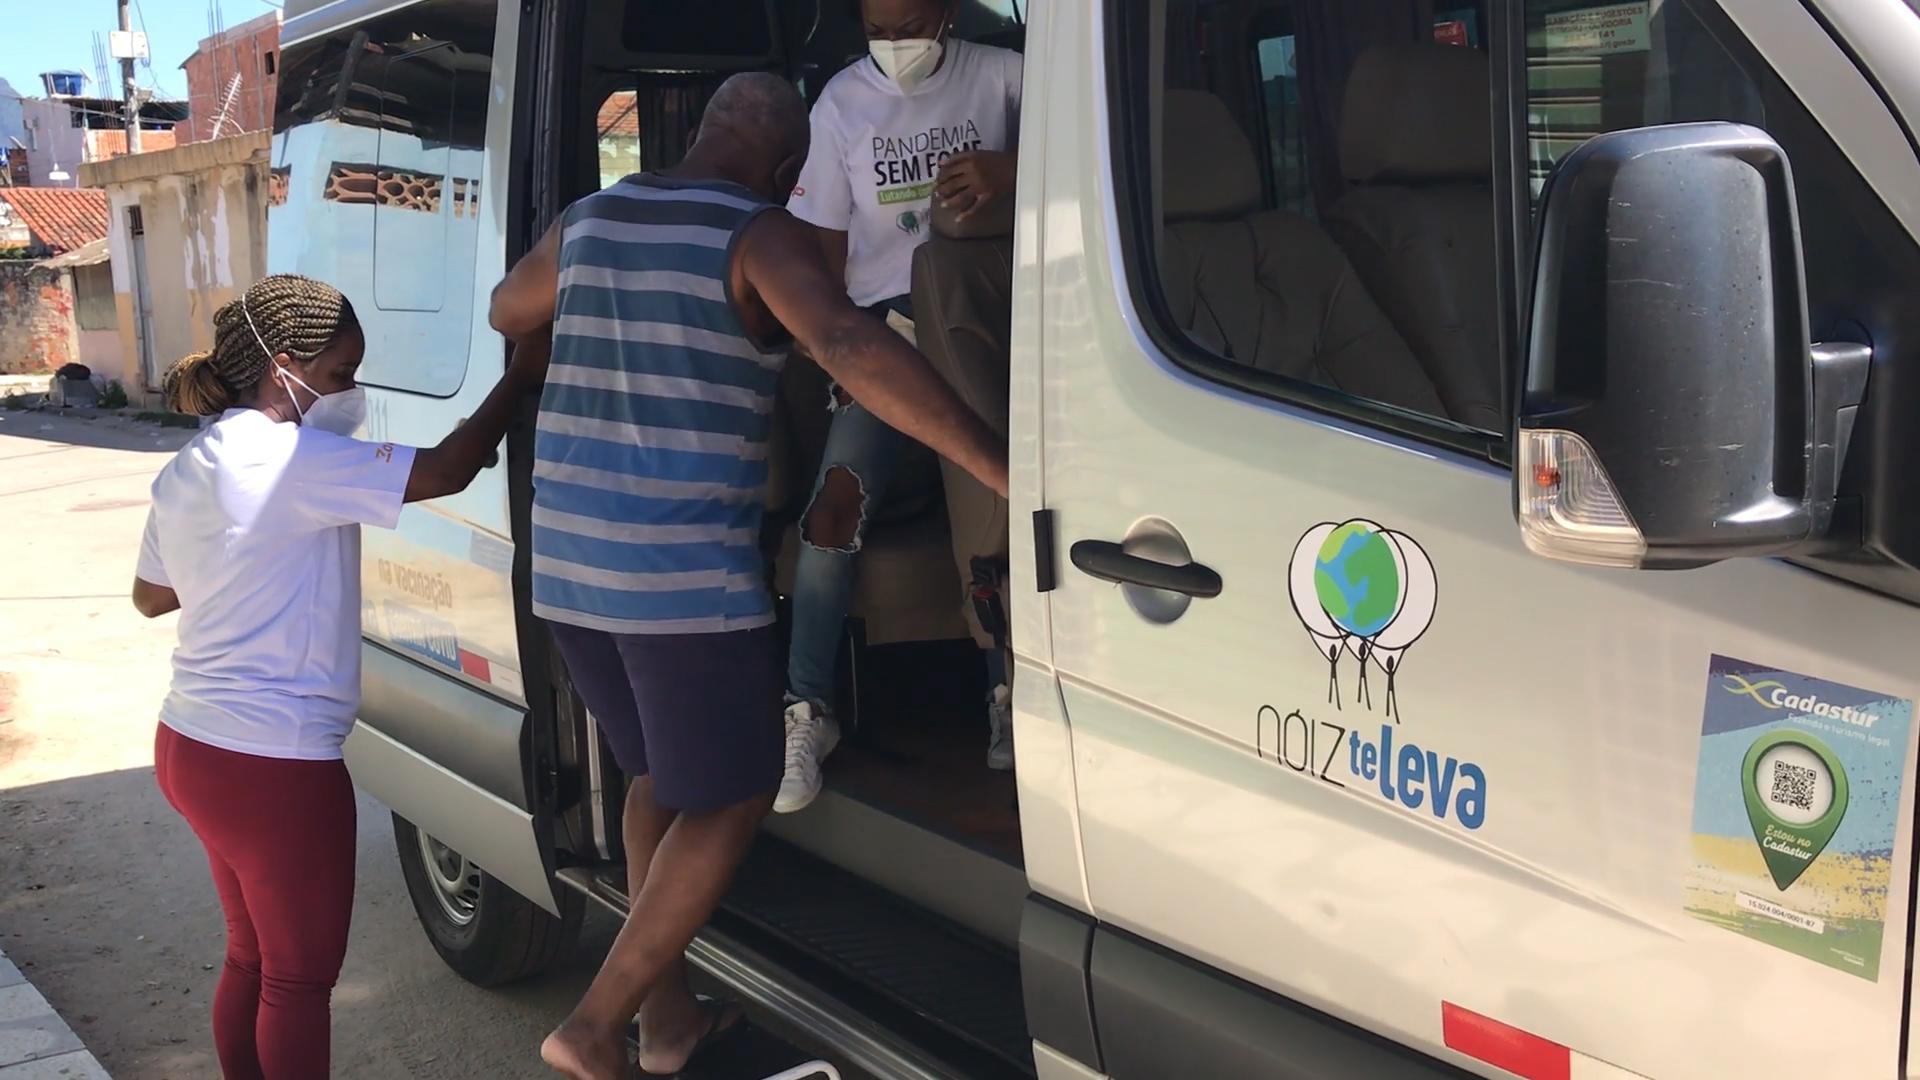 ONG da Cidade de Deus busca idosos em casa para vacinar contra a Covid-19